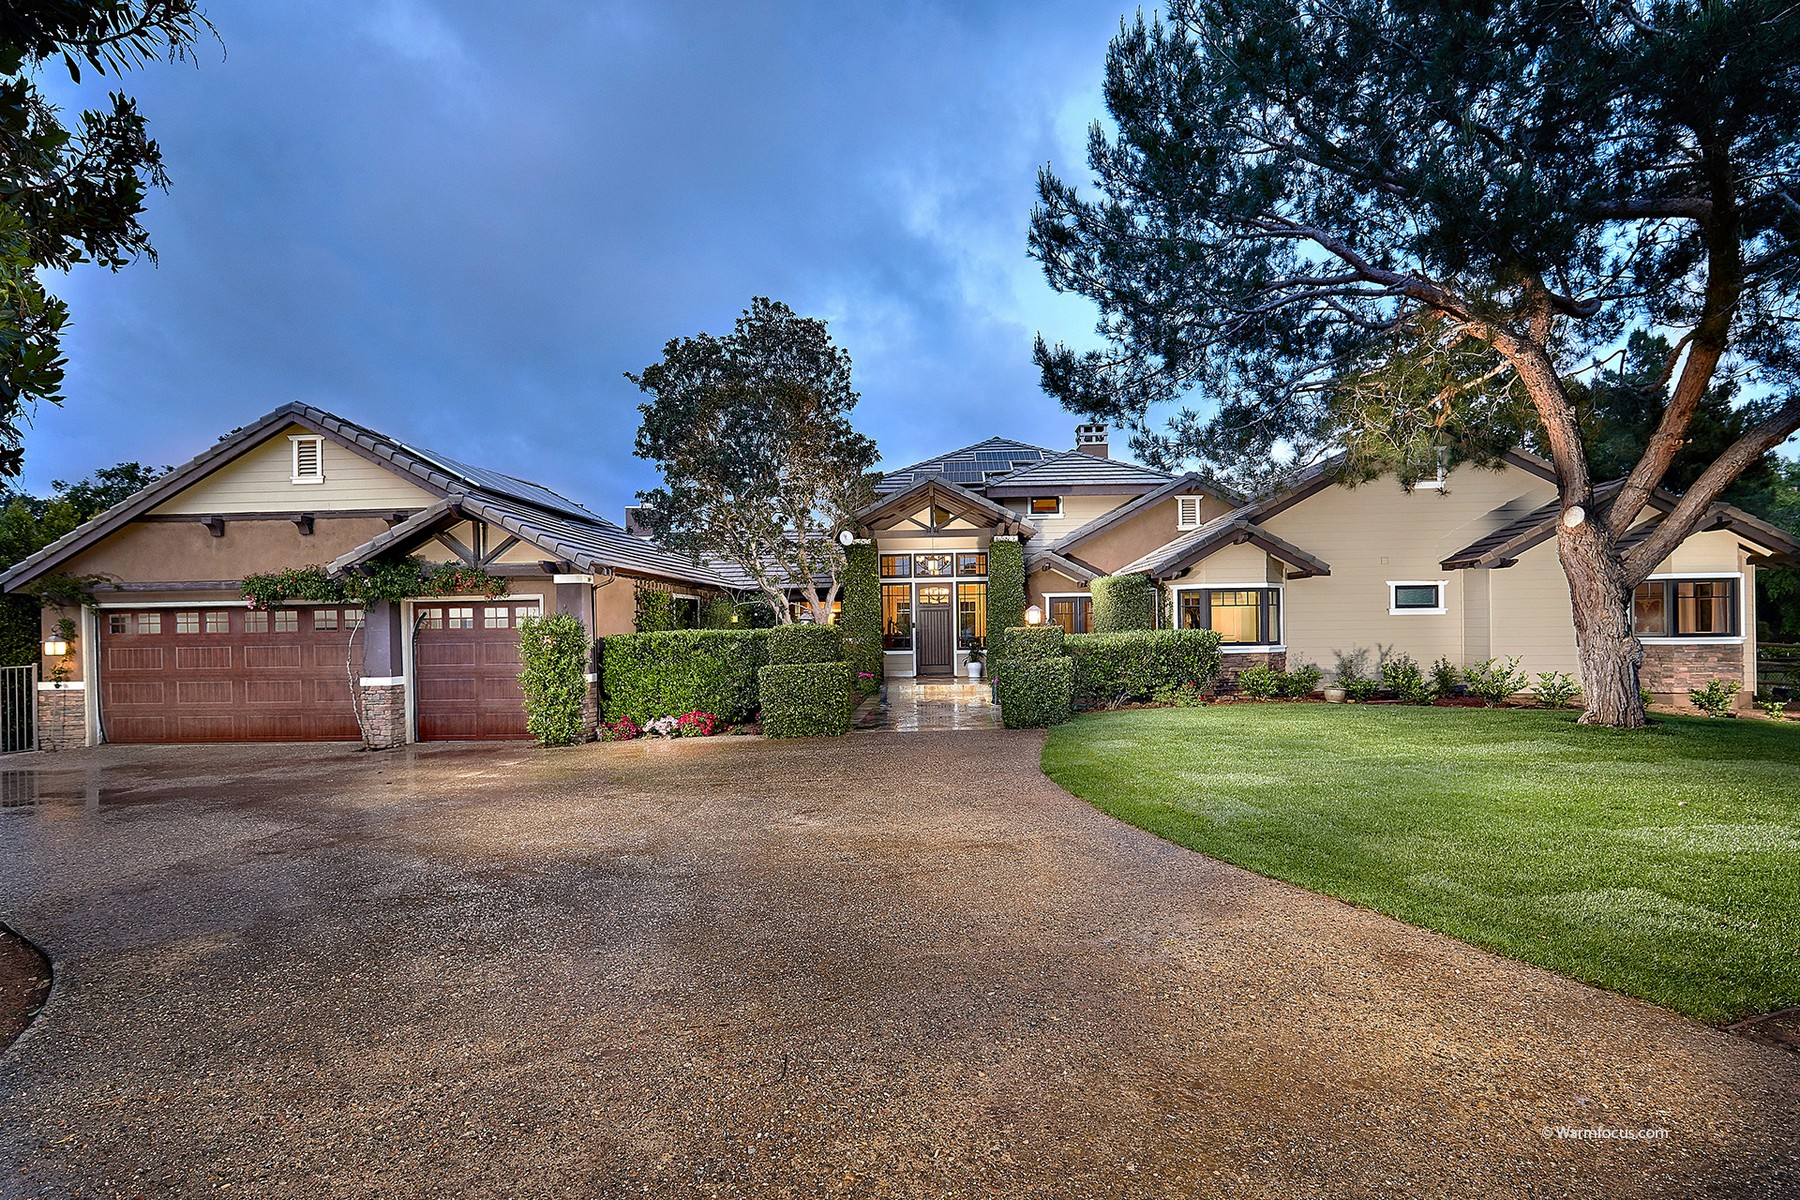 Single Family Home for Active at 20461 Fortuna Del Sur Escondido, California 92029 United States